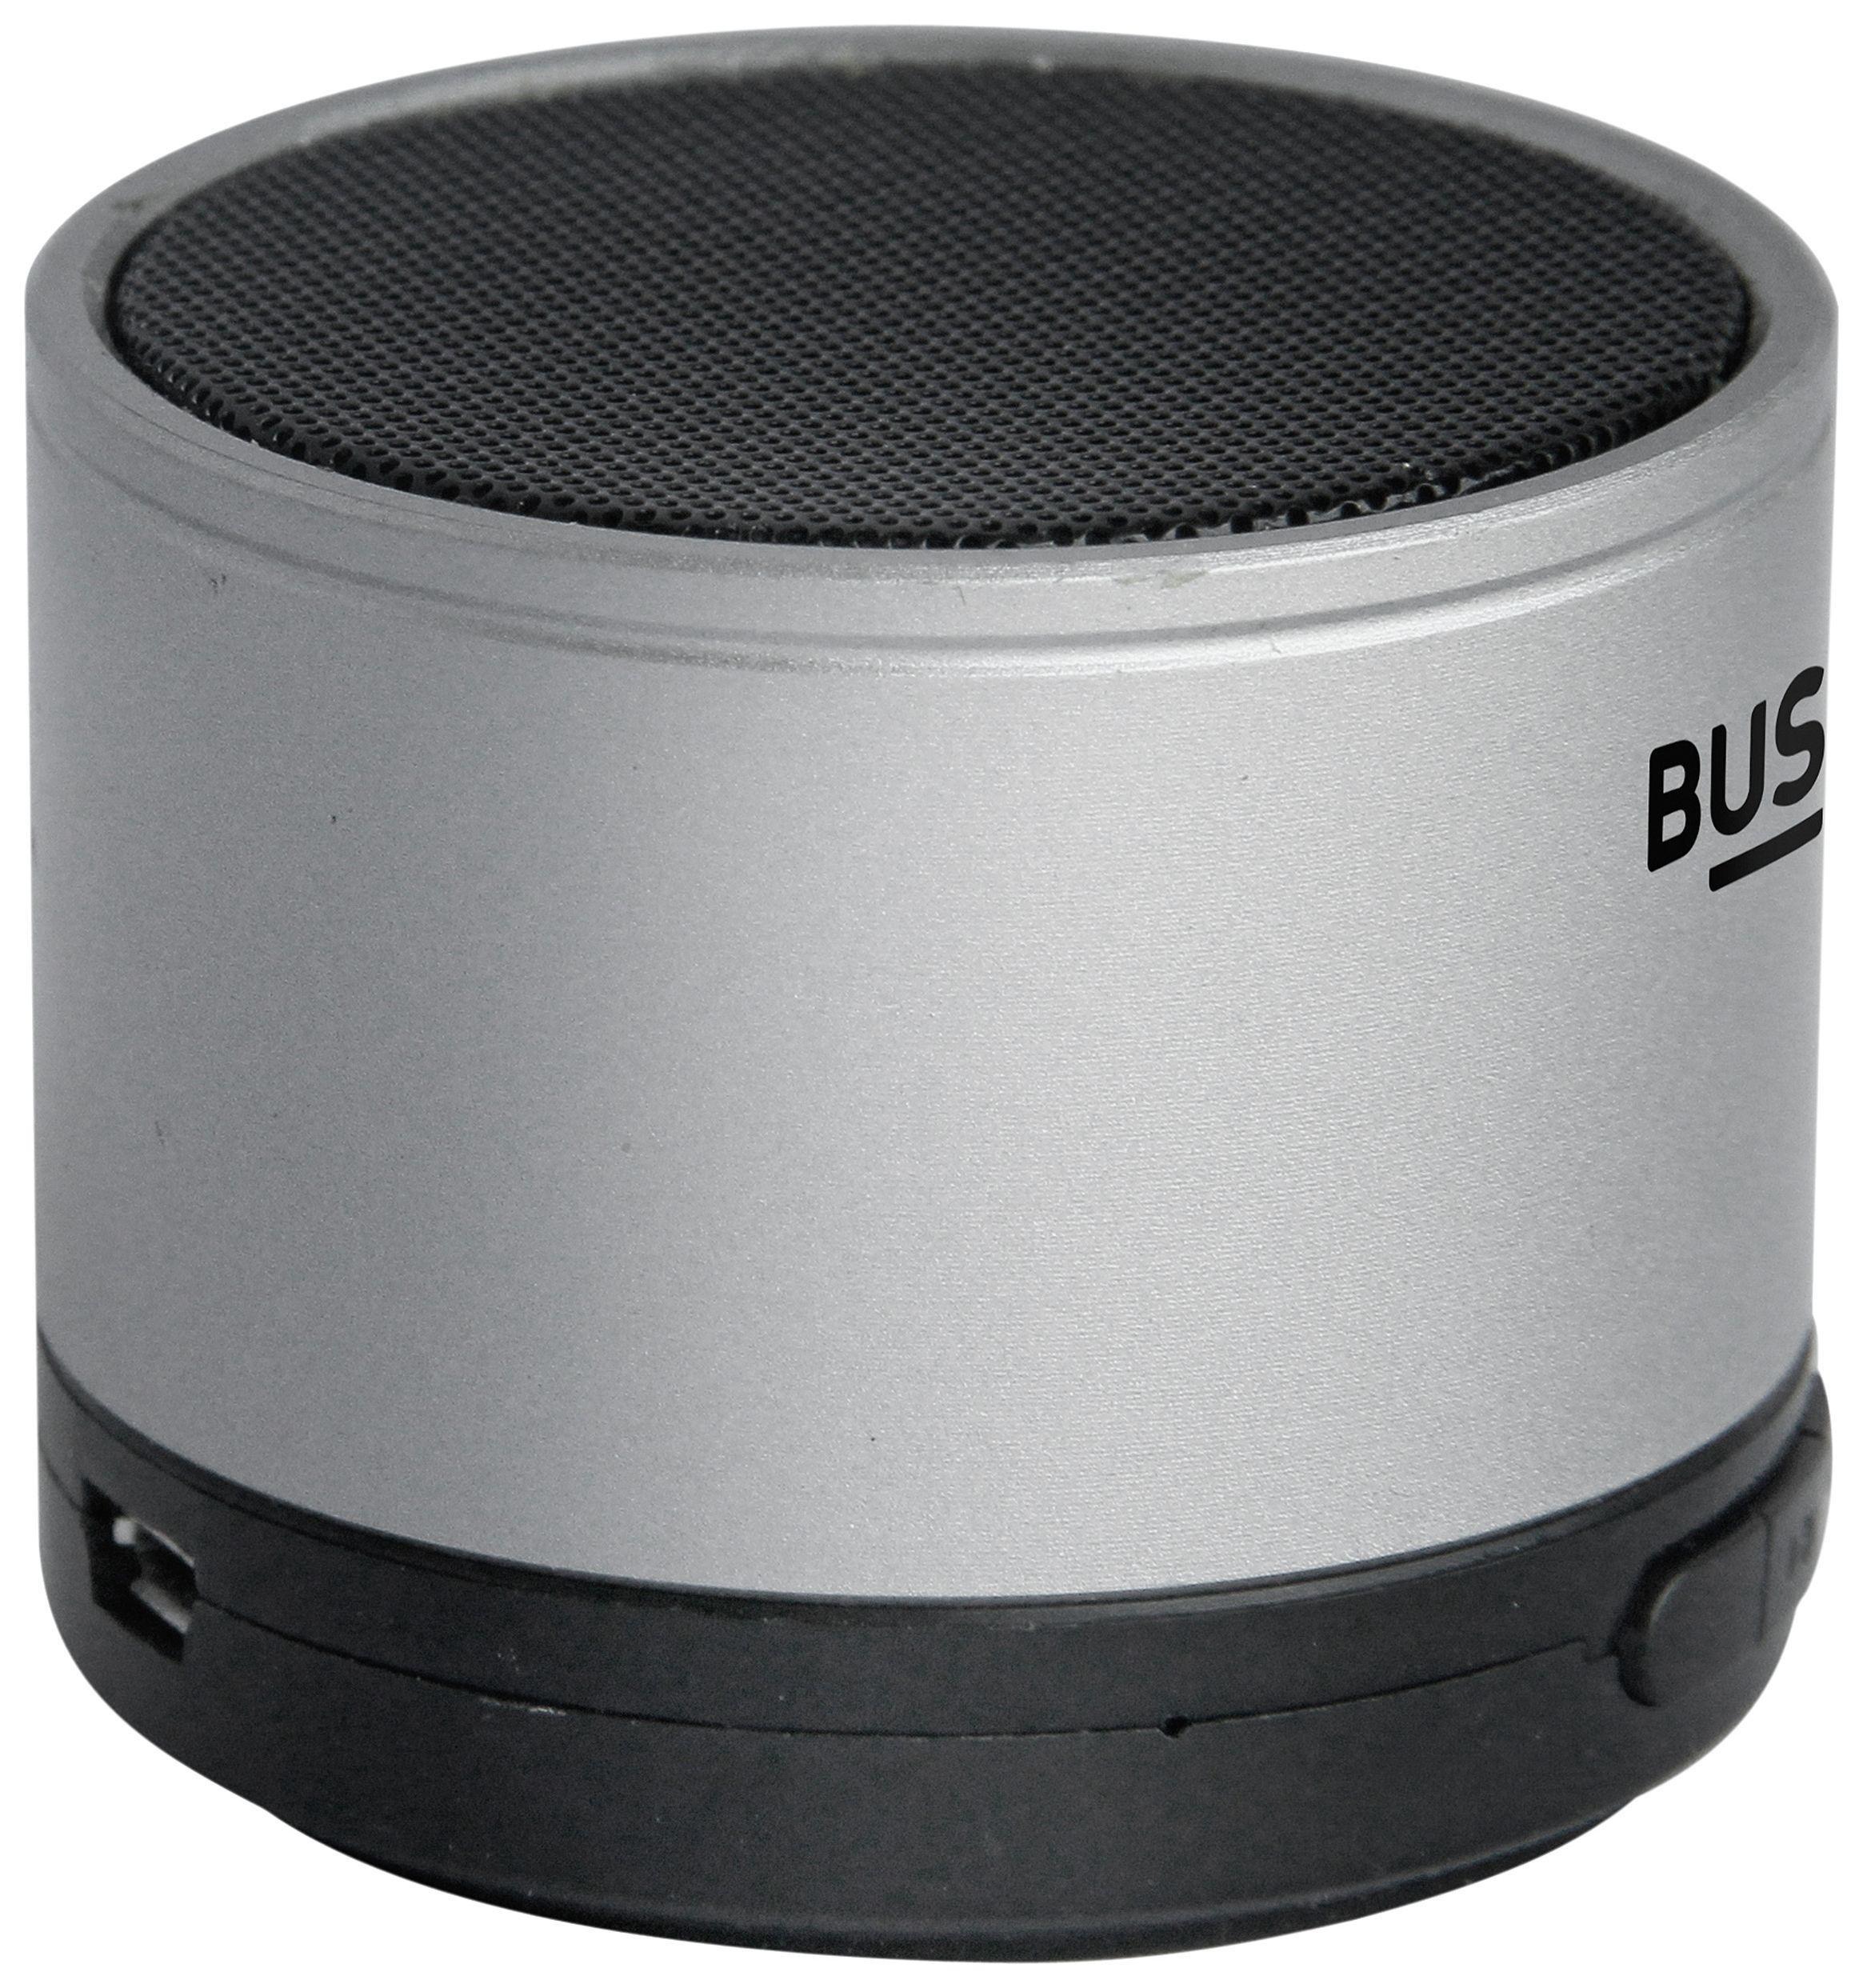 Bush Portable Bluetooth Speaker Silver